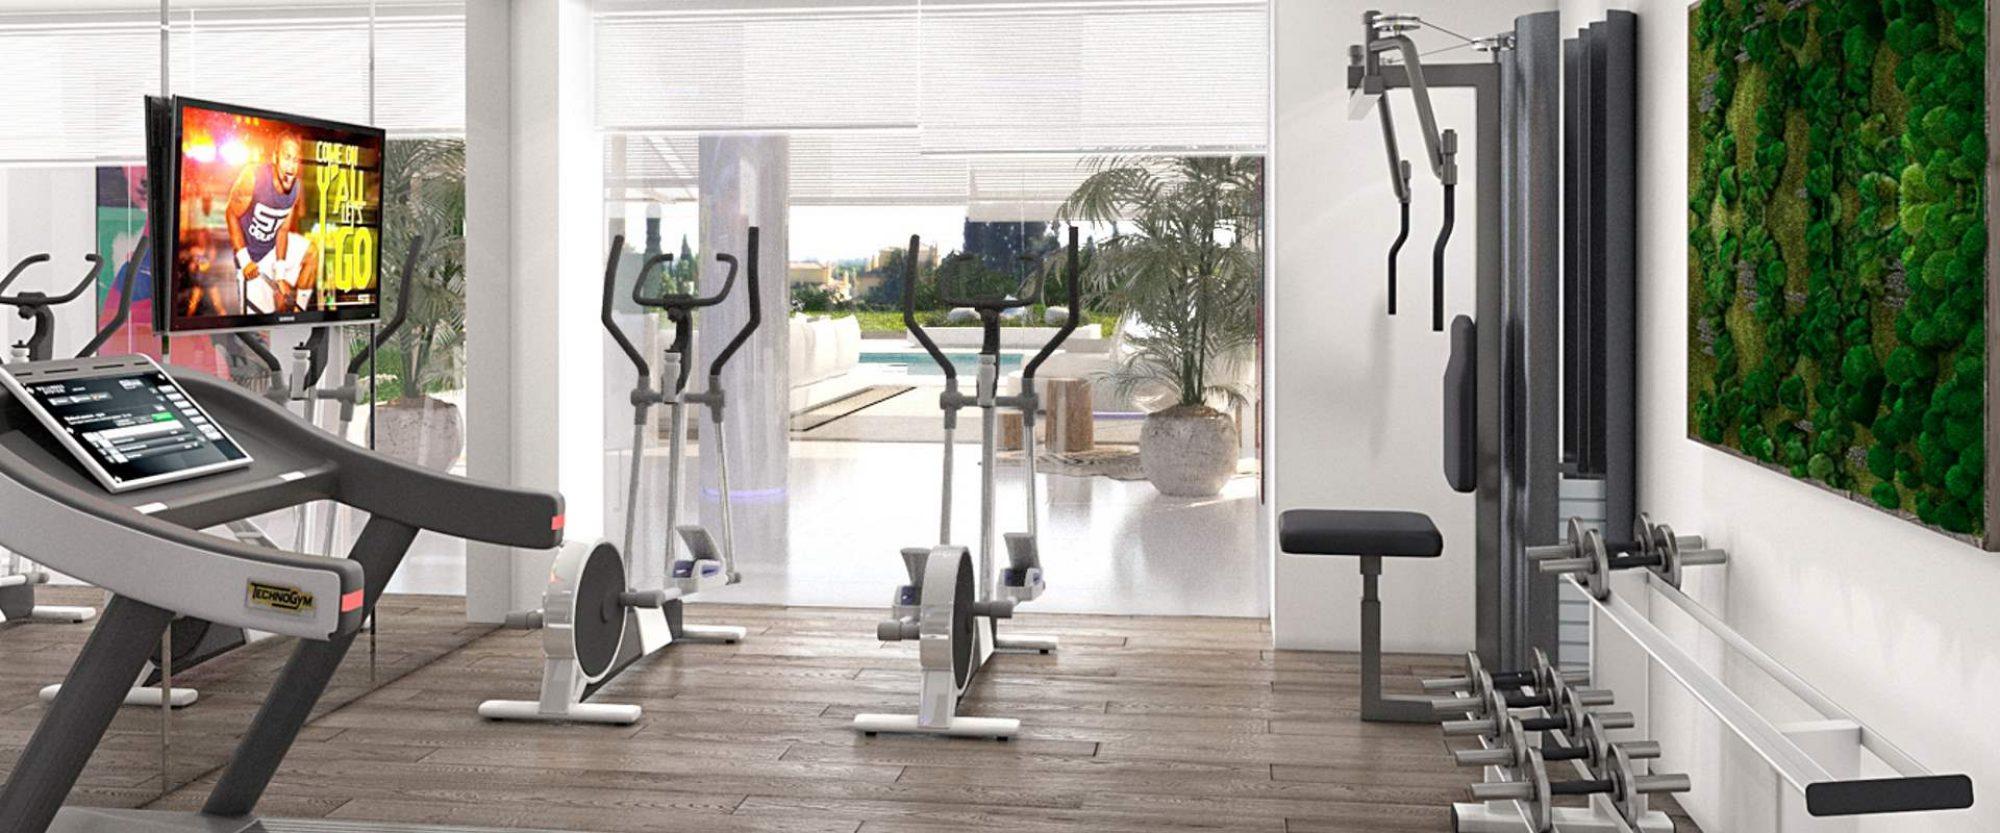 Cascada de Camojan Property for sale with gym